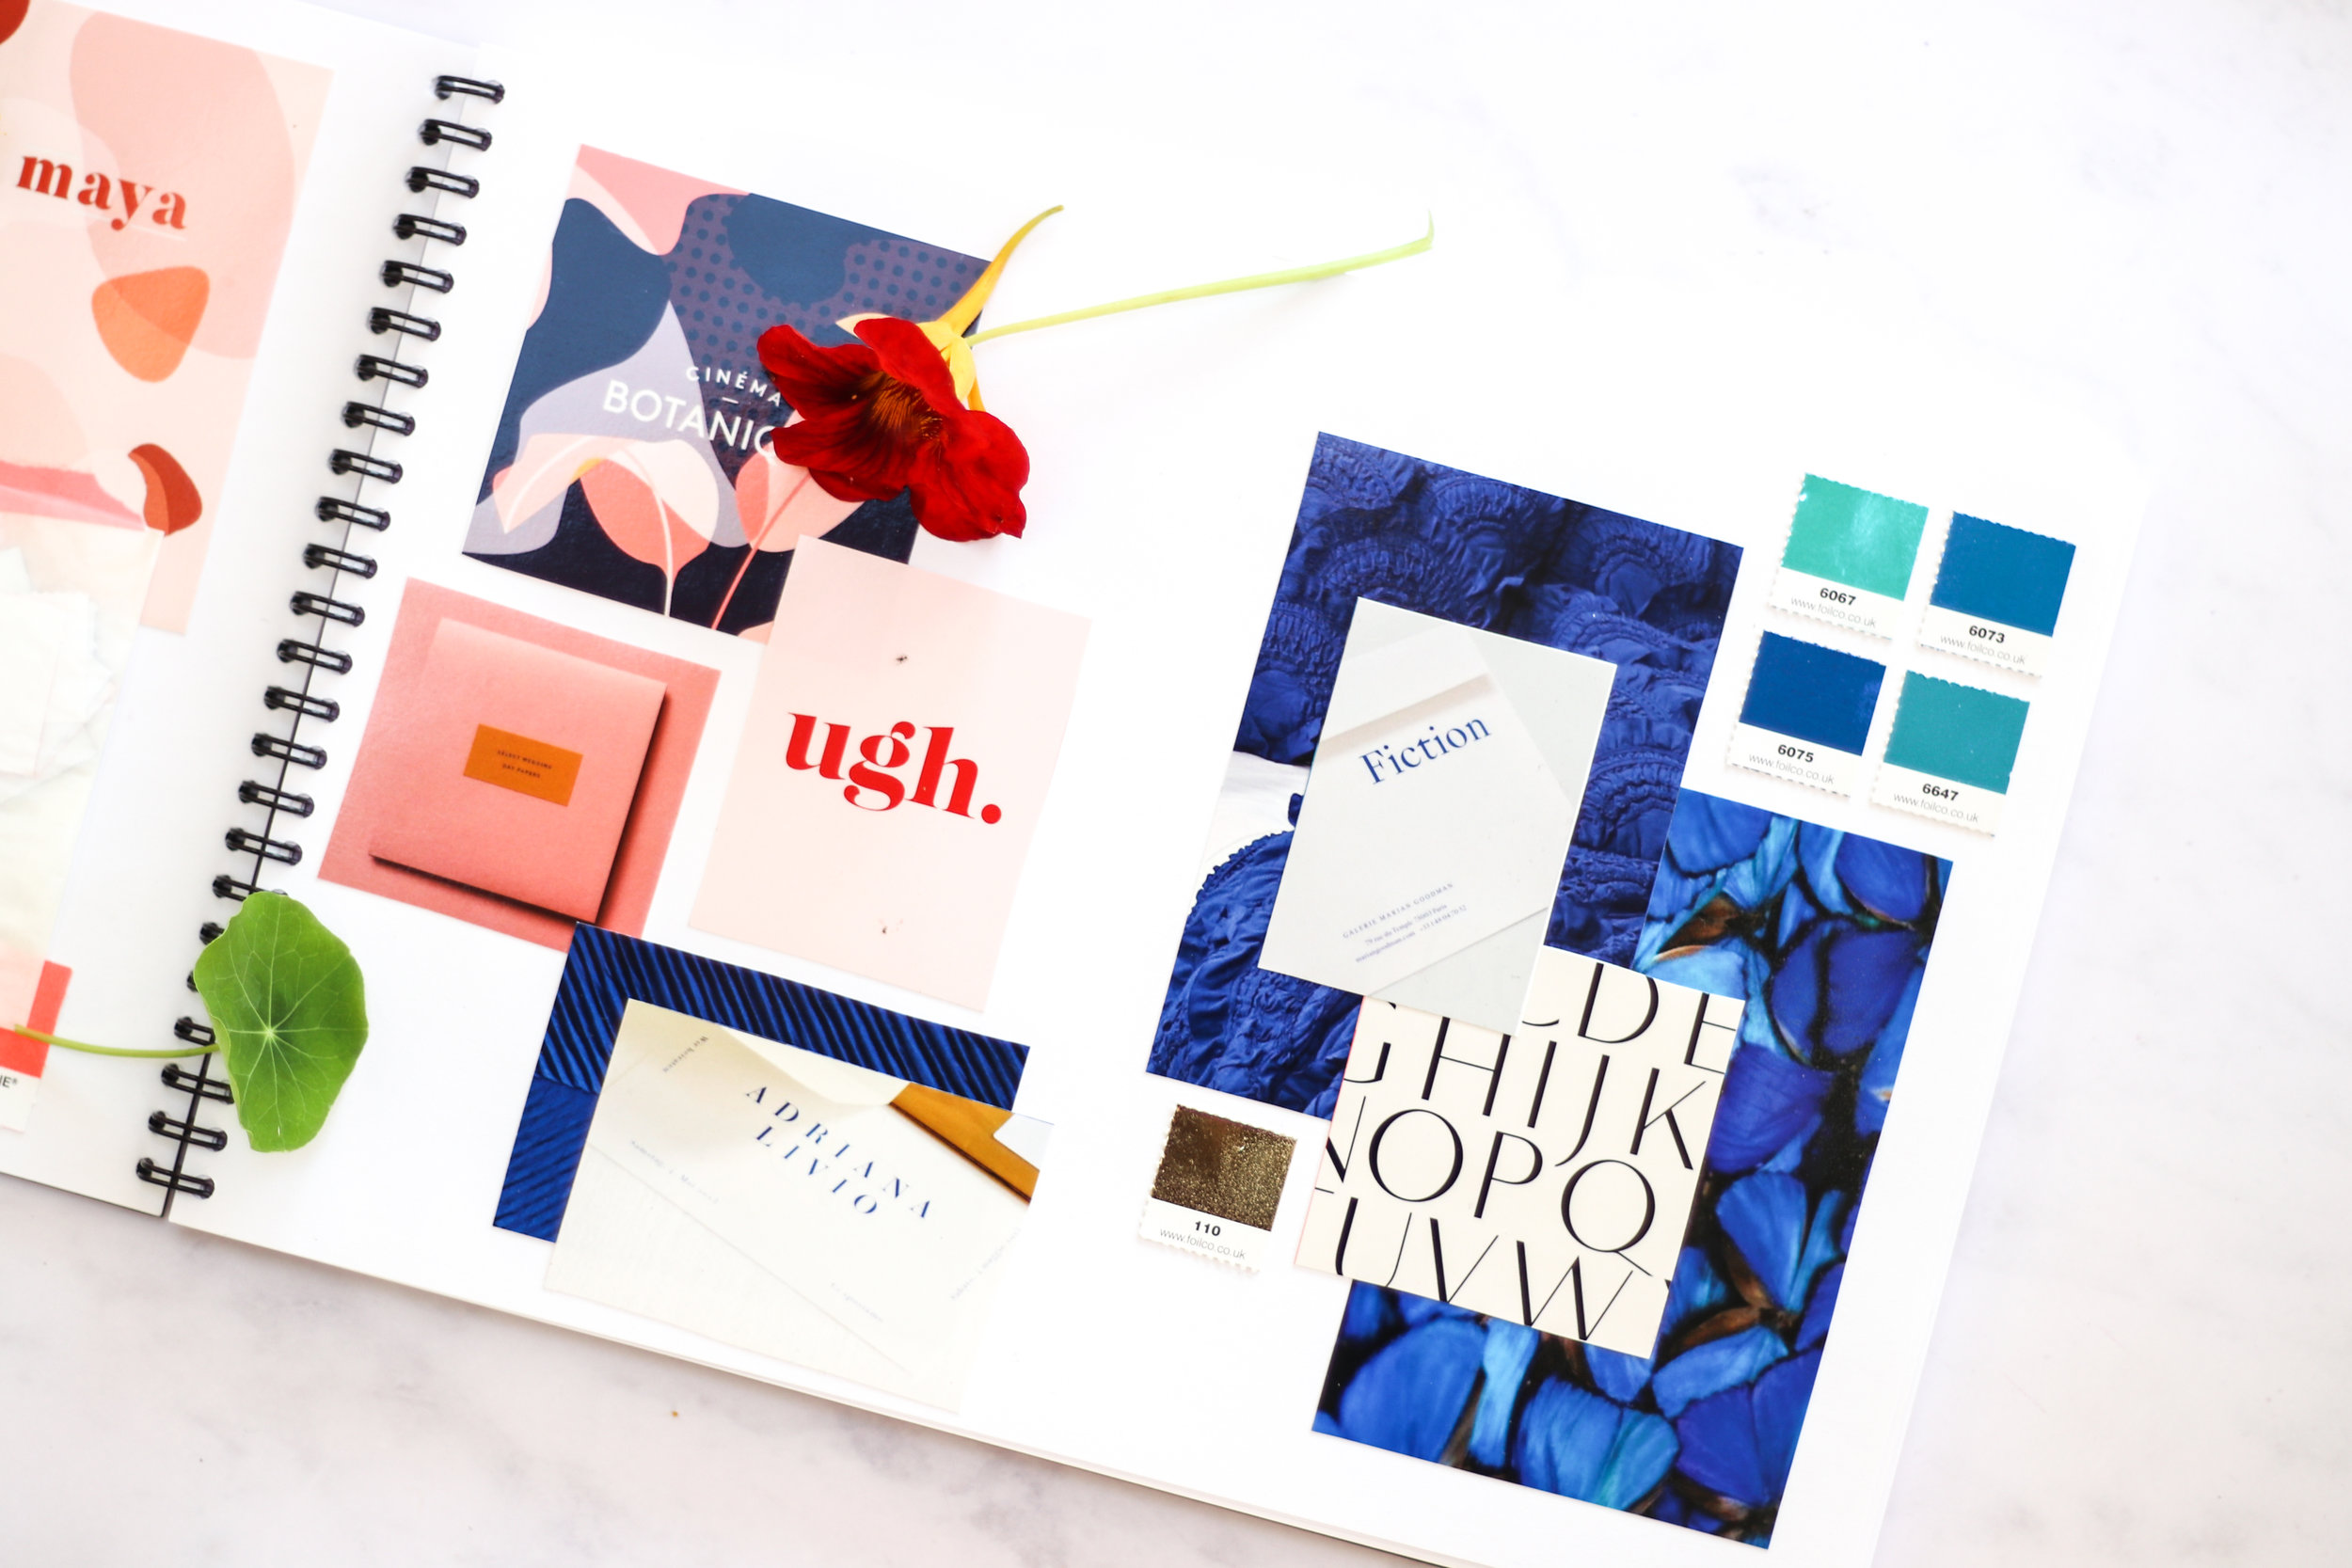 fiona humberstone sophie robinson collaboration the brand stylist-25.jpg